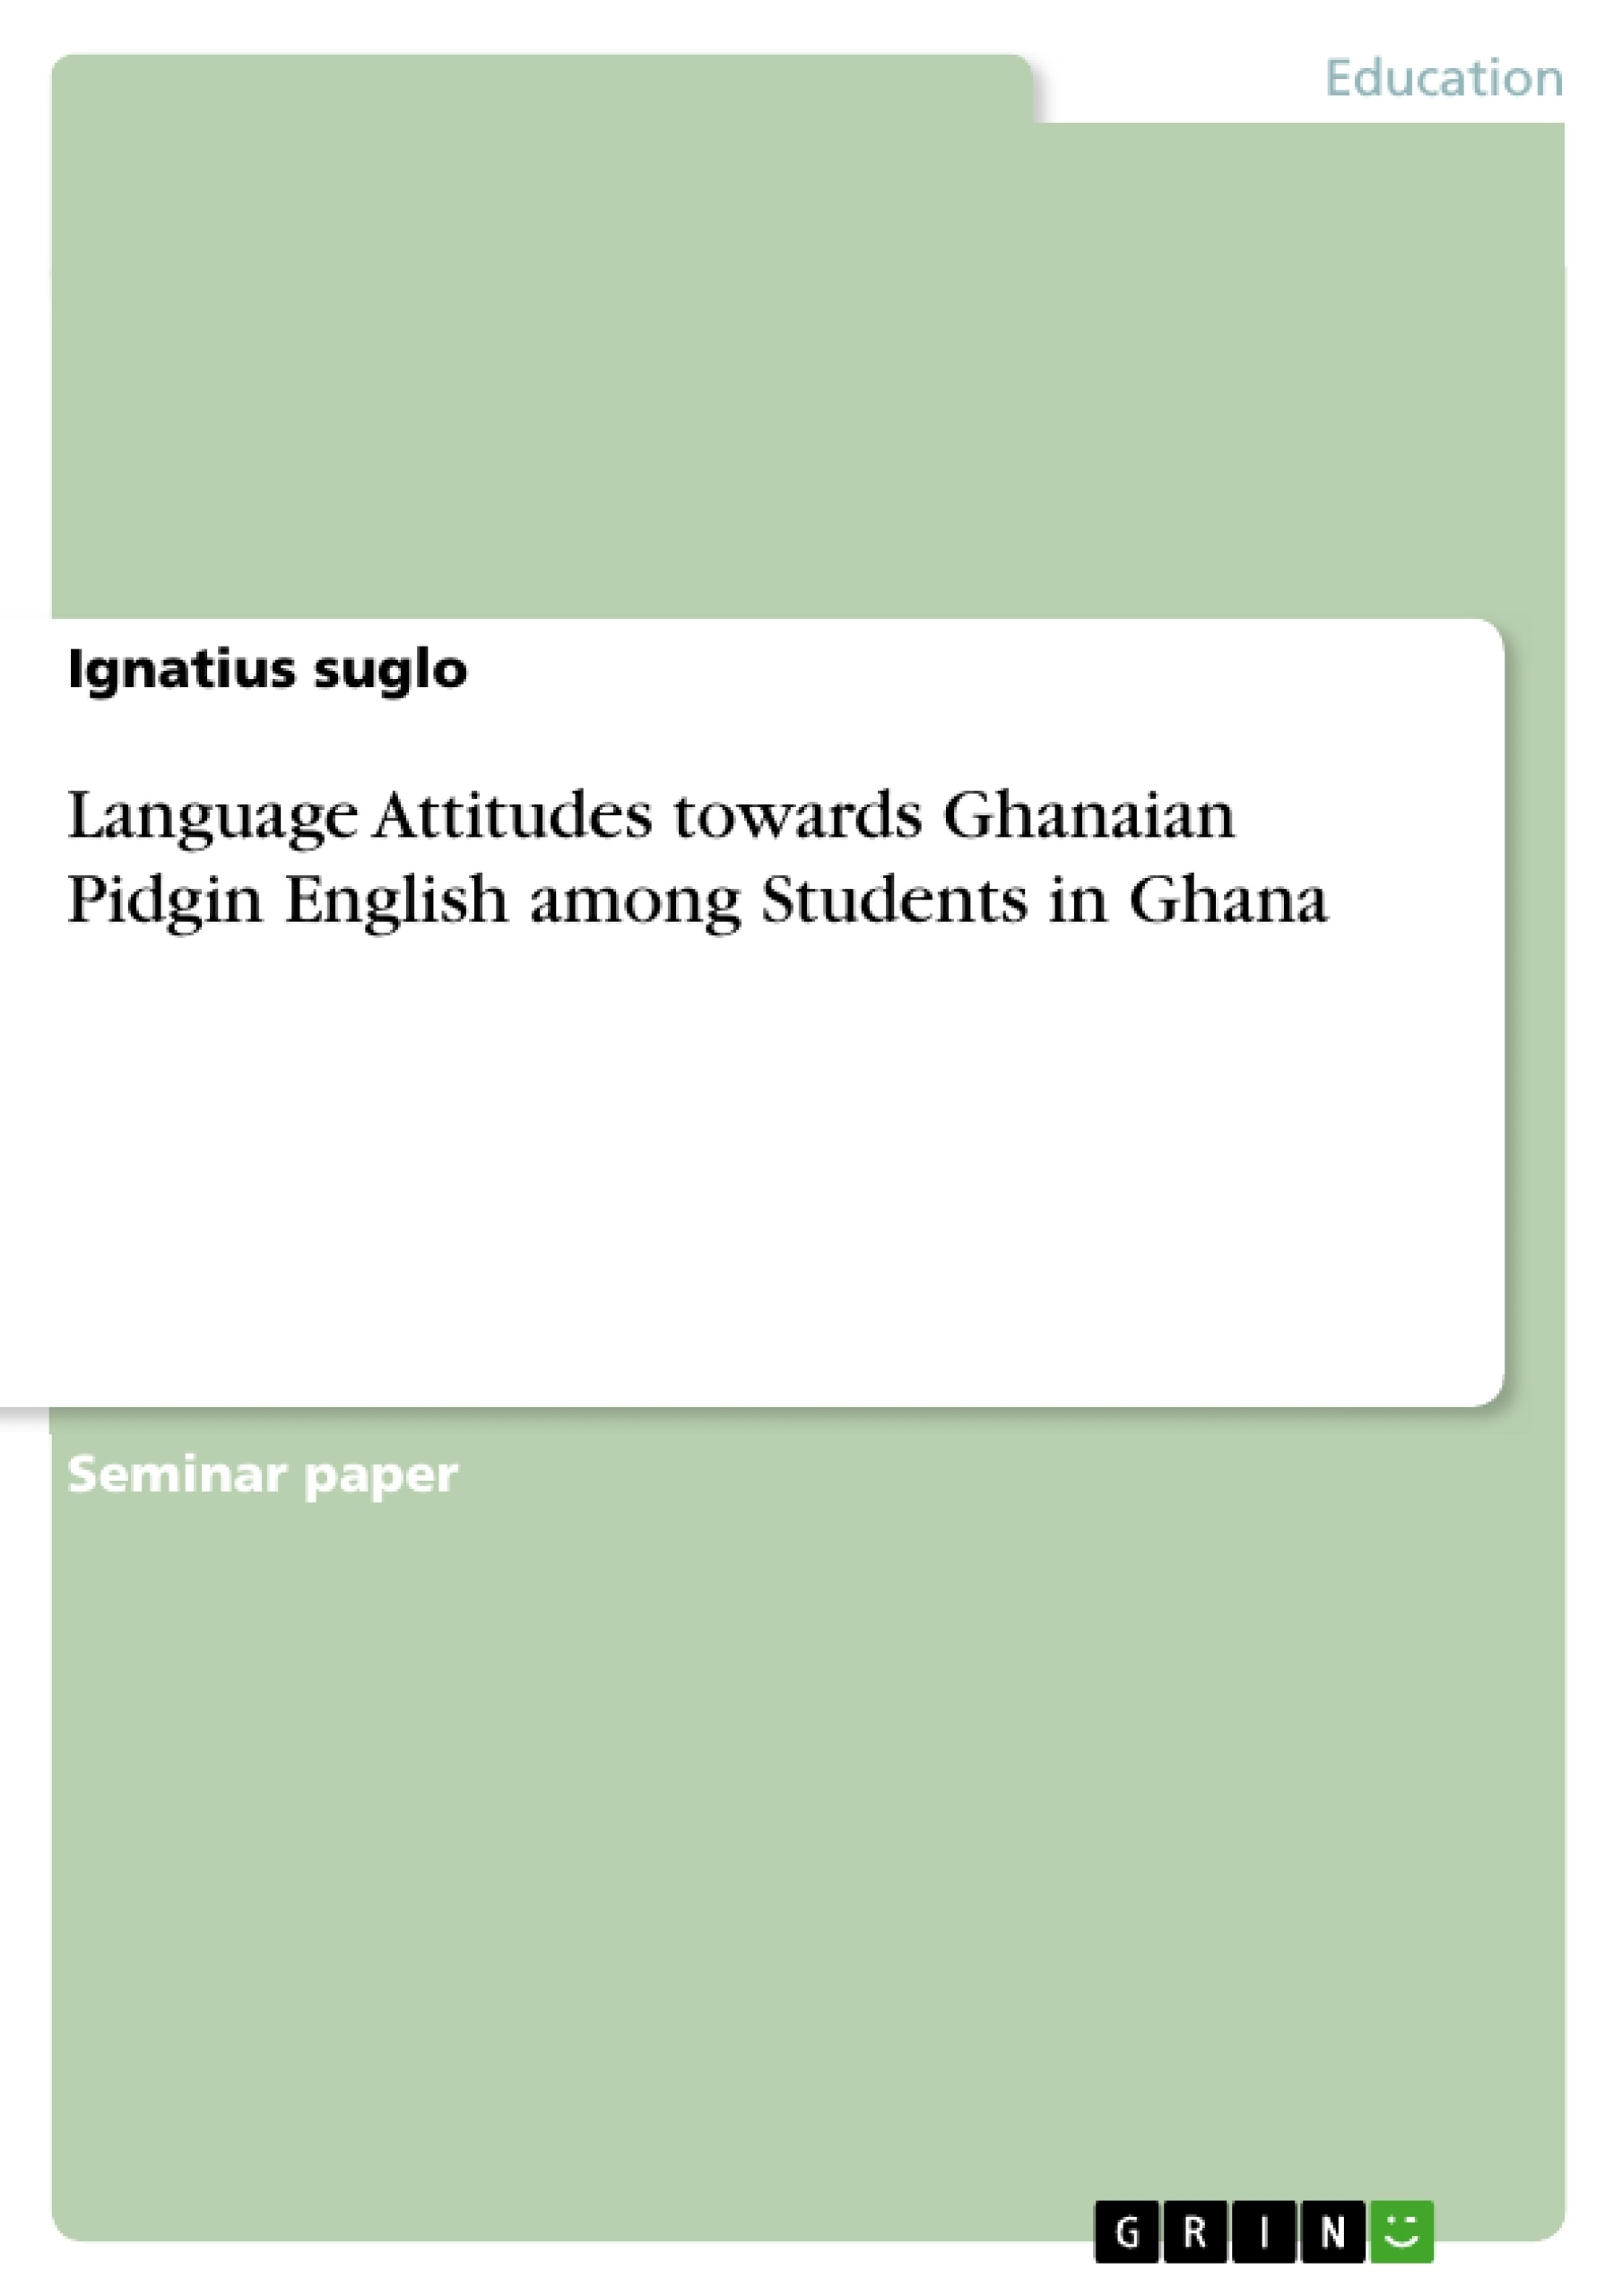 Title: Language Attitudes towards Ghanaian Pidgin English among Students in Ghana